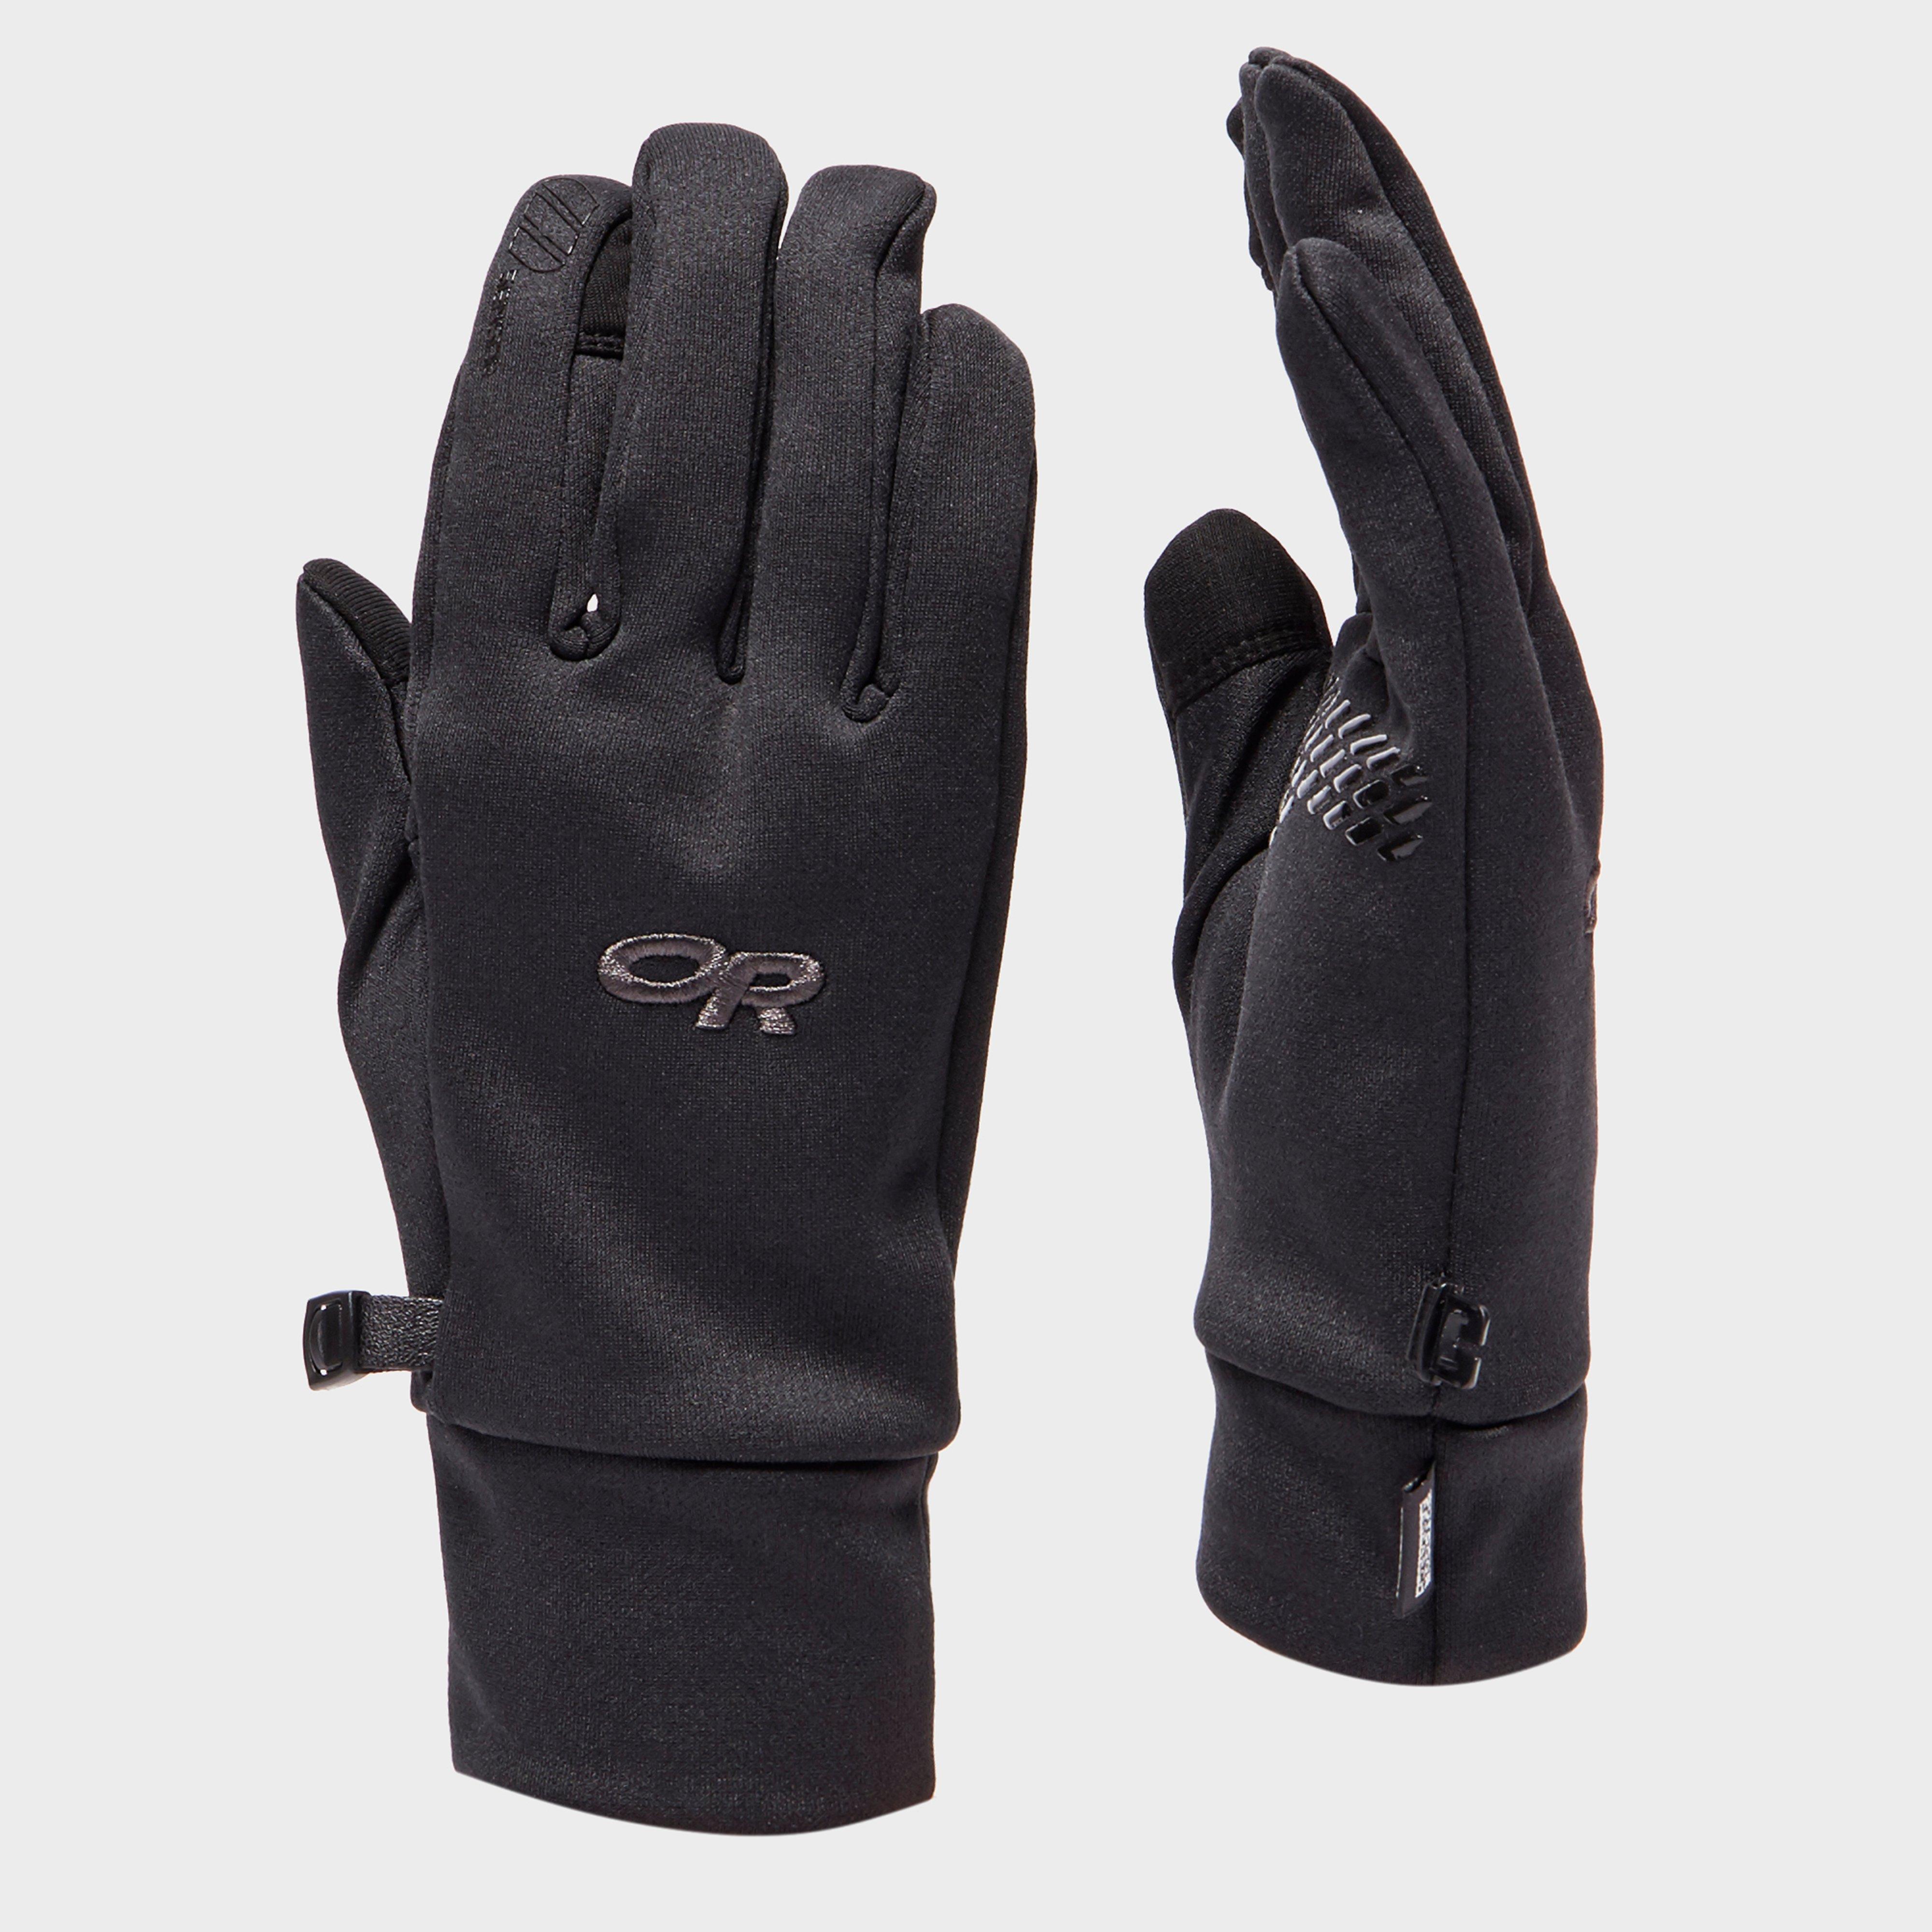 Outdoor Research Outdoor Research Mens PL100 Sensor Gloves - Black, Black